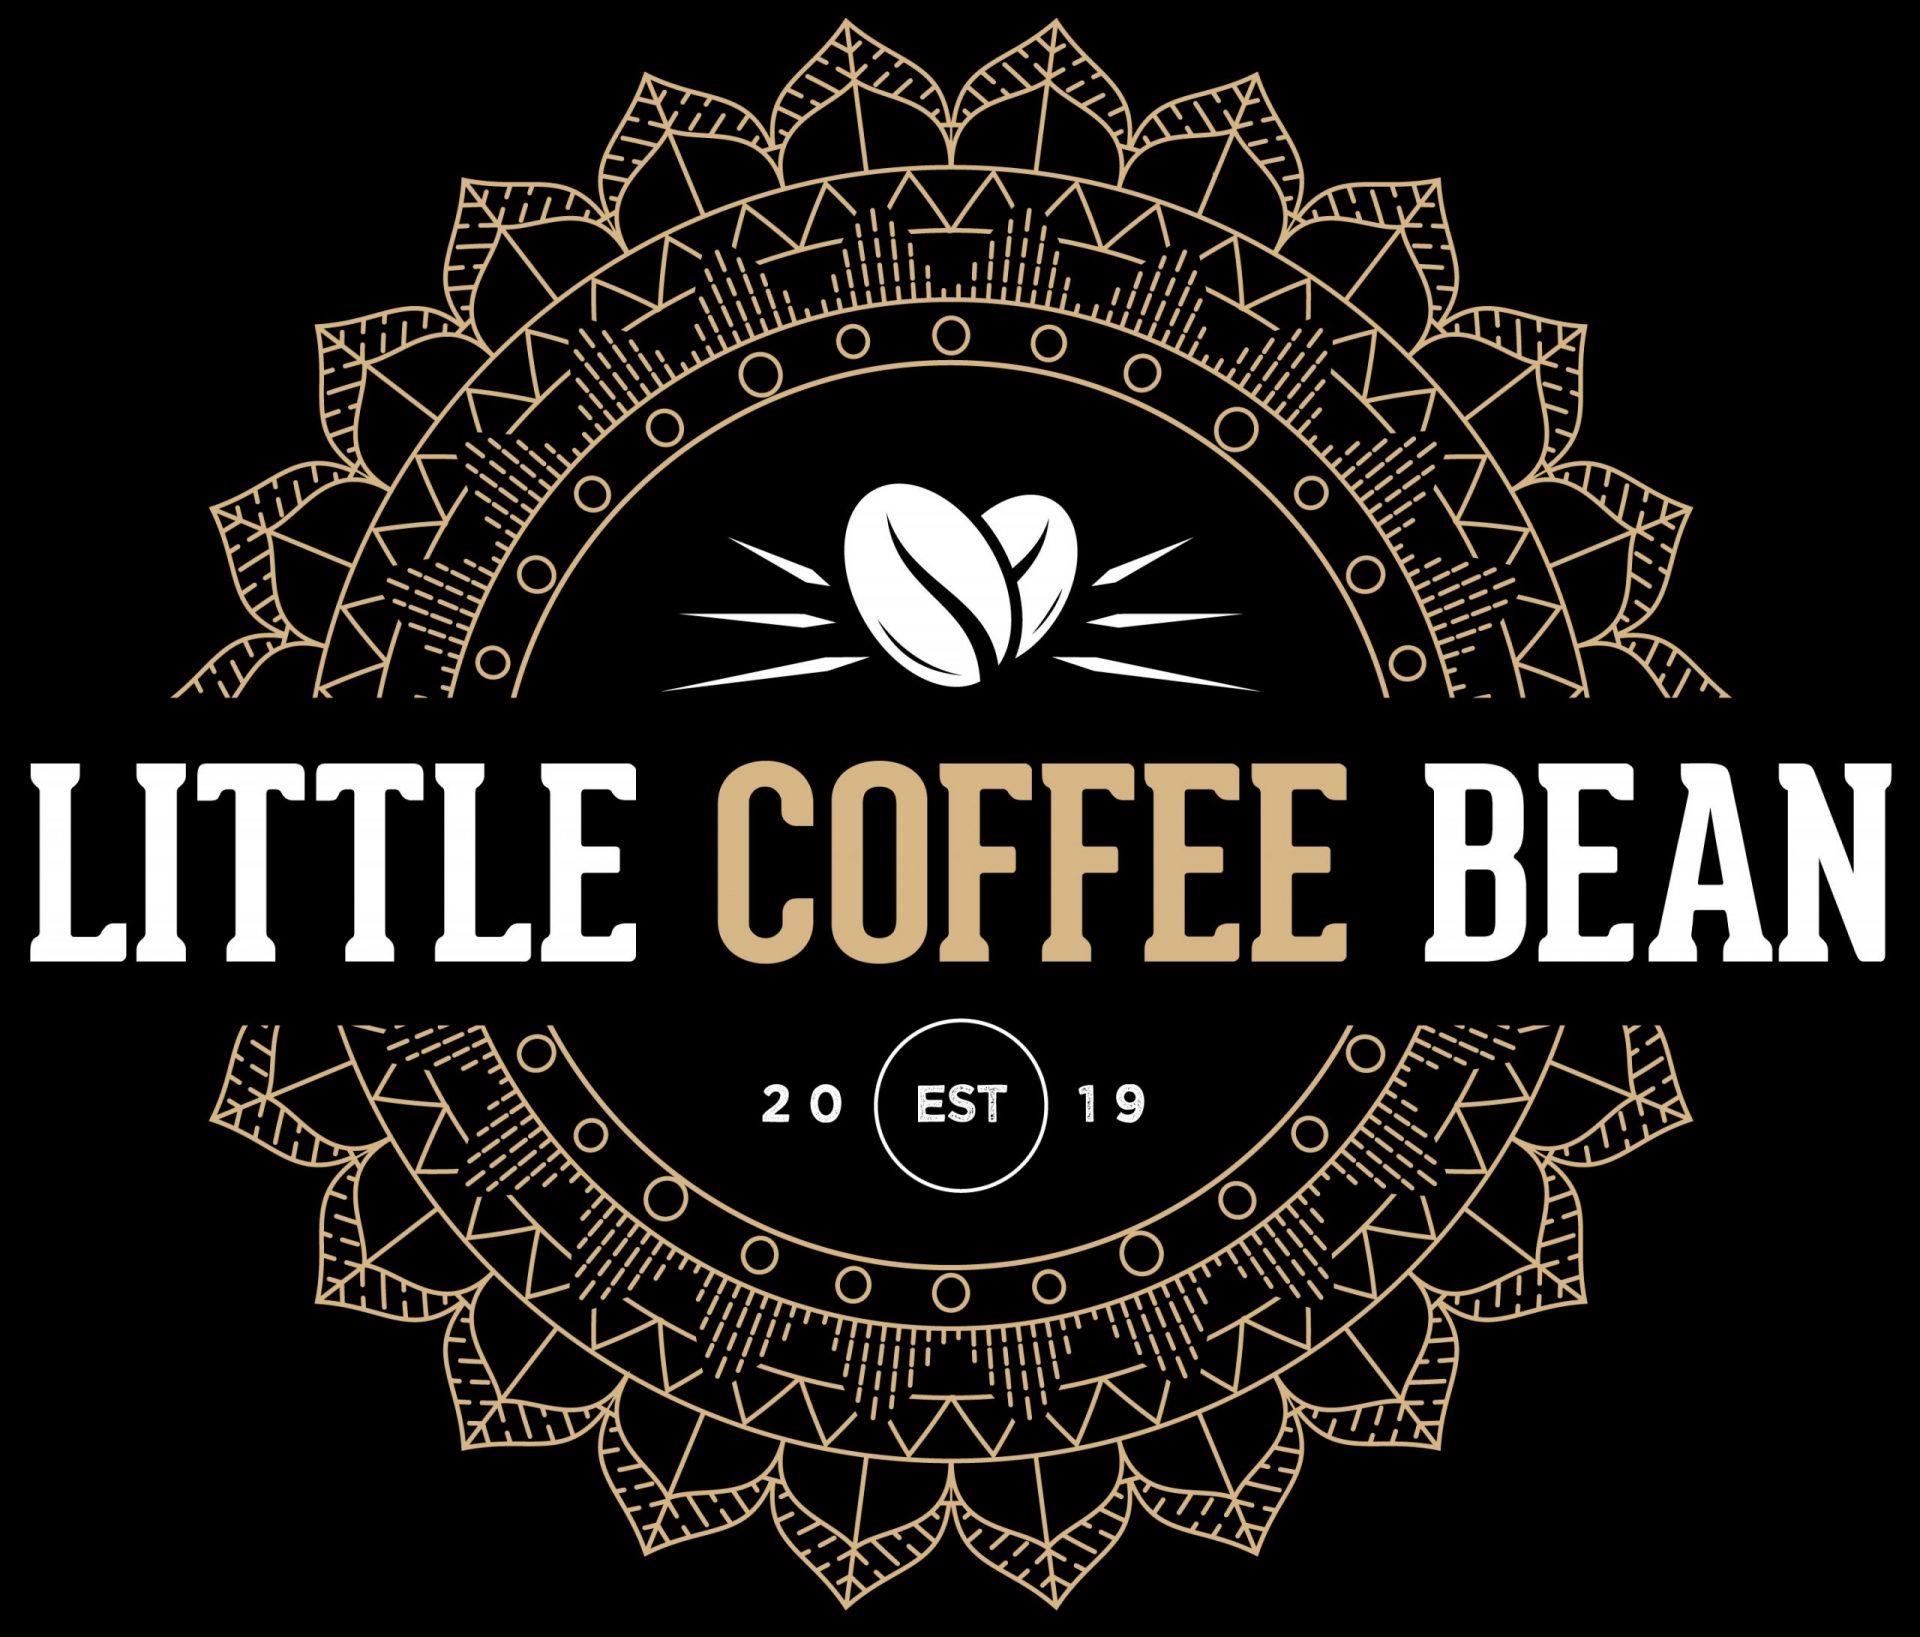 Little Coffee Bean Company